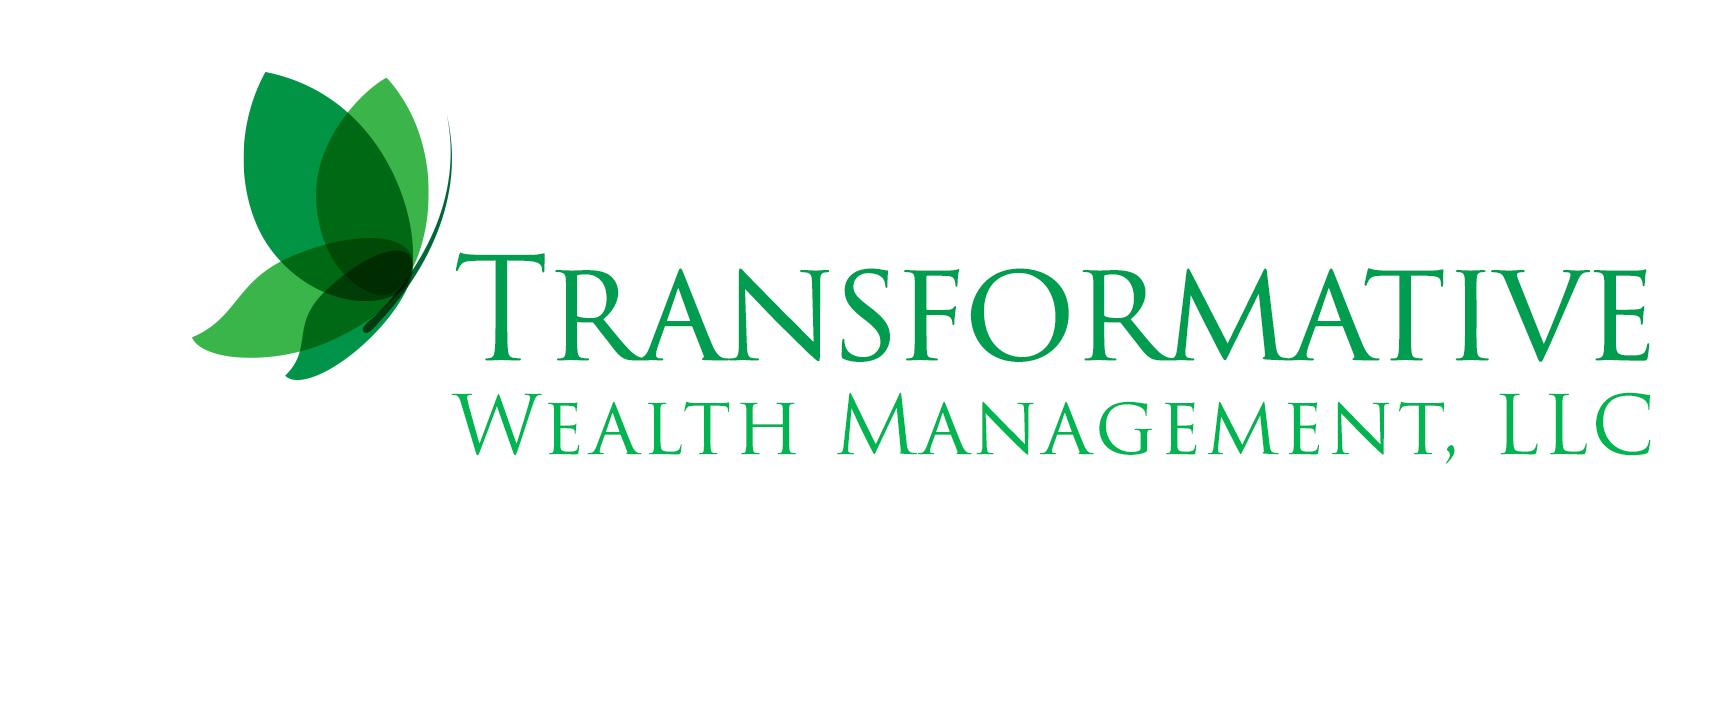 Transformative Wealth Management, LLC